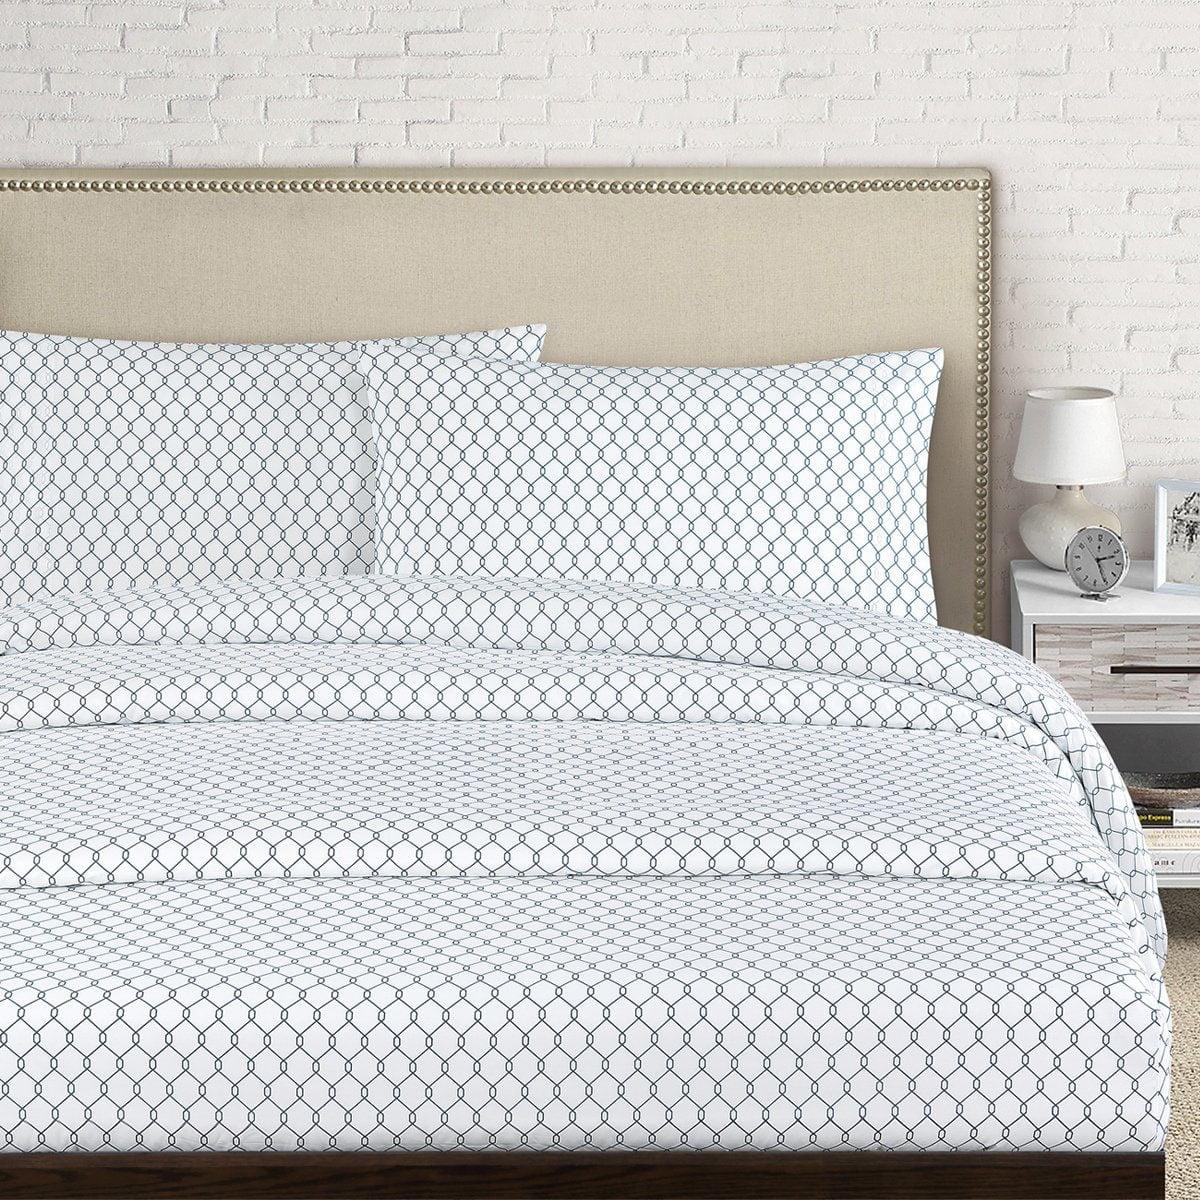 Echelon Home Fence 250 Thread Count Cotton Percale Sheet Set - Walmart.com